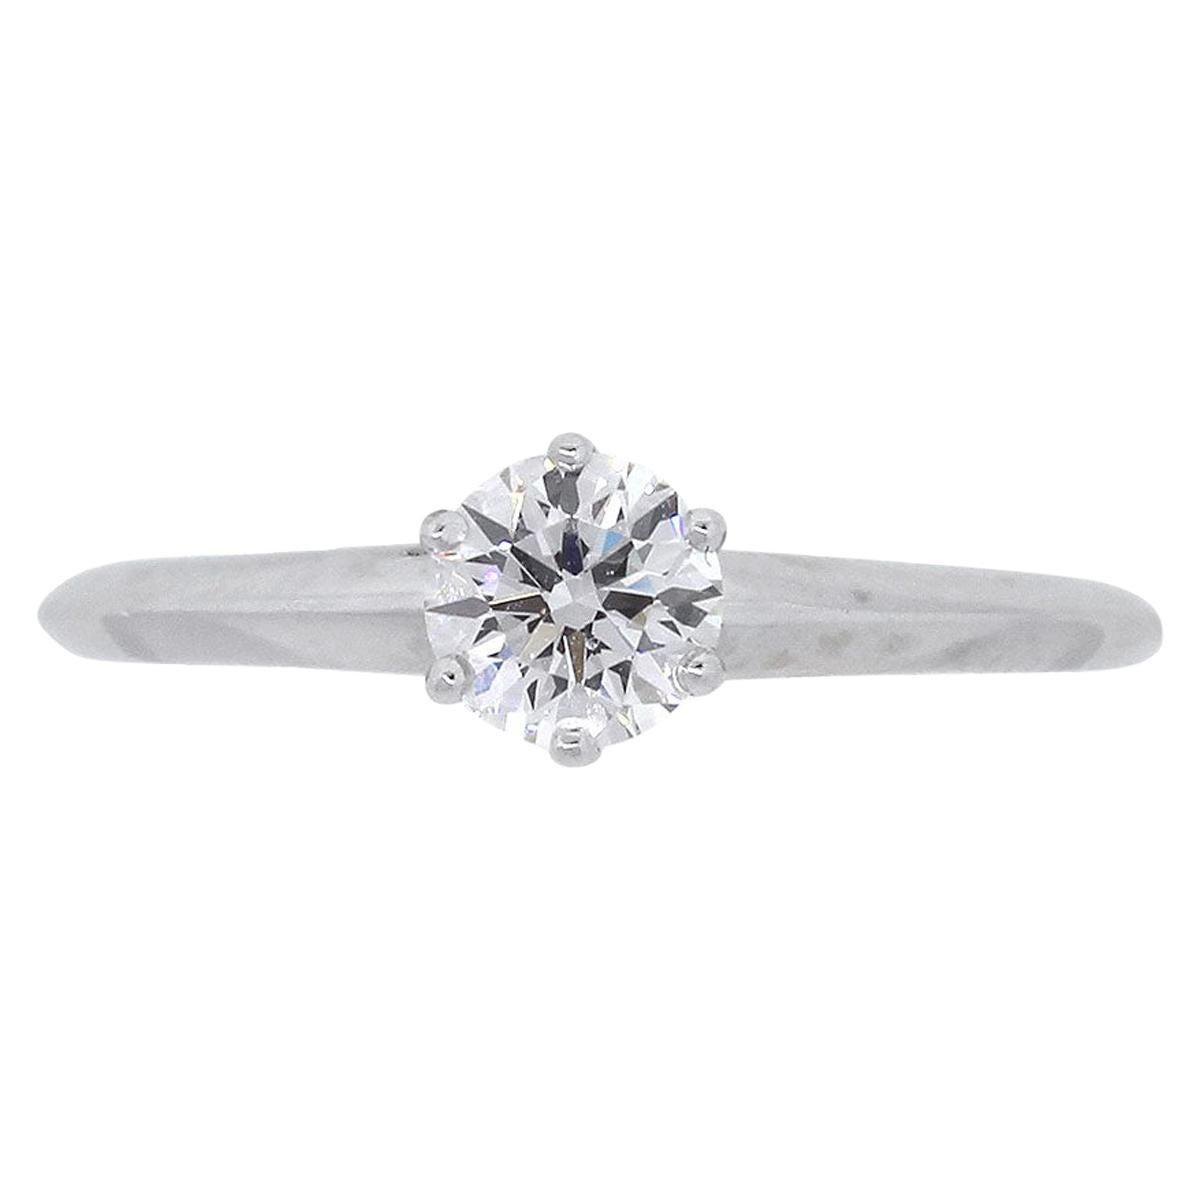 Tiffany & Co. Round Brilliant Diamond Engagement Ring